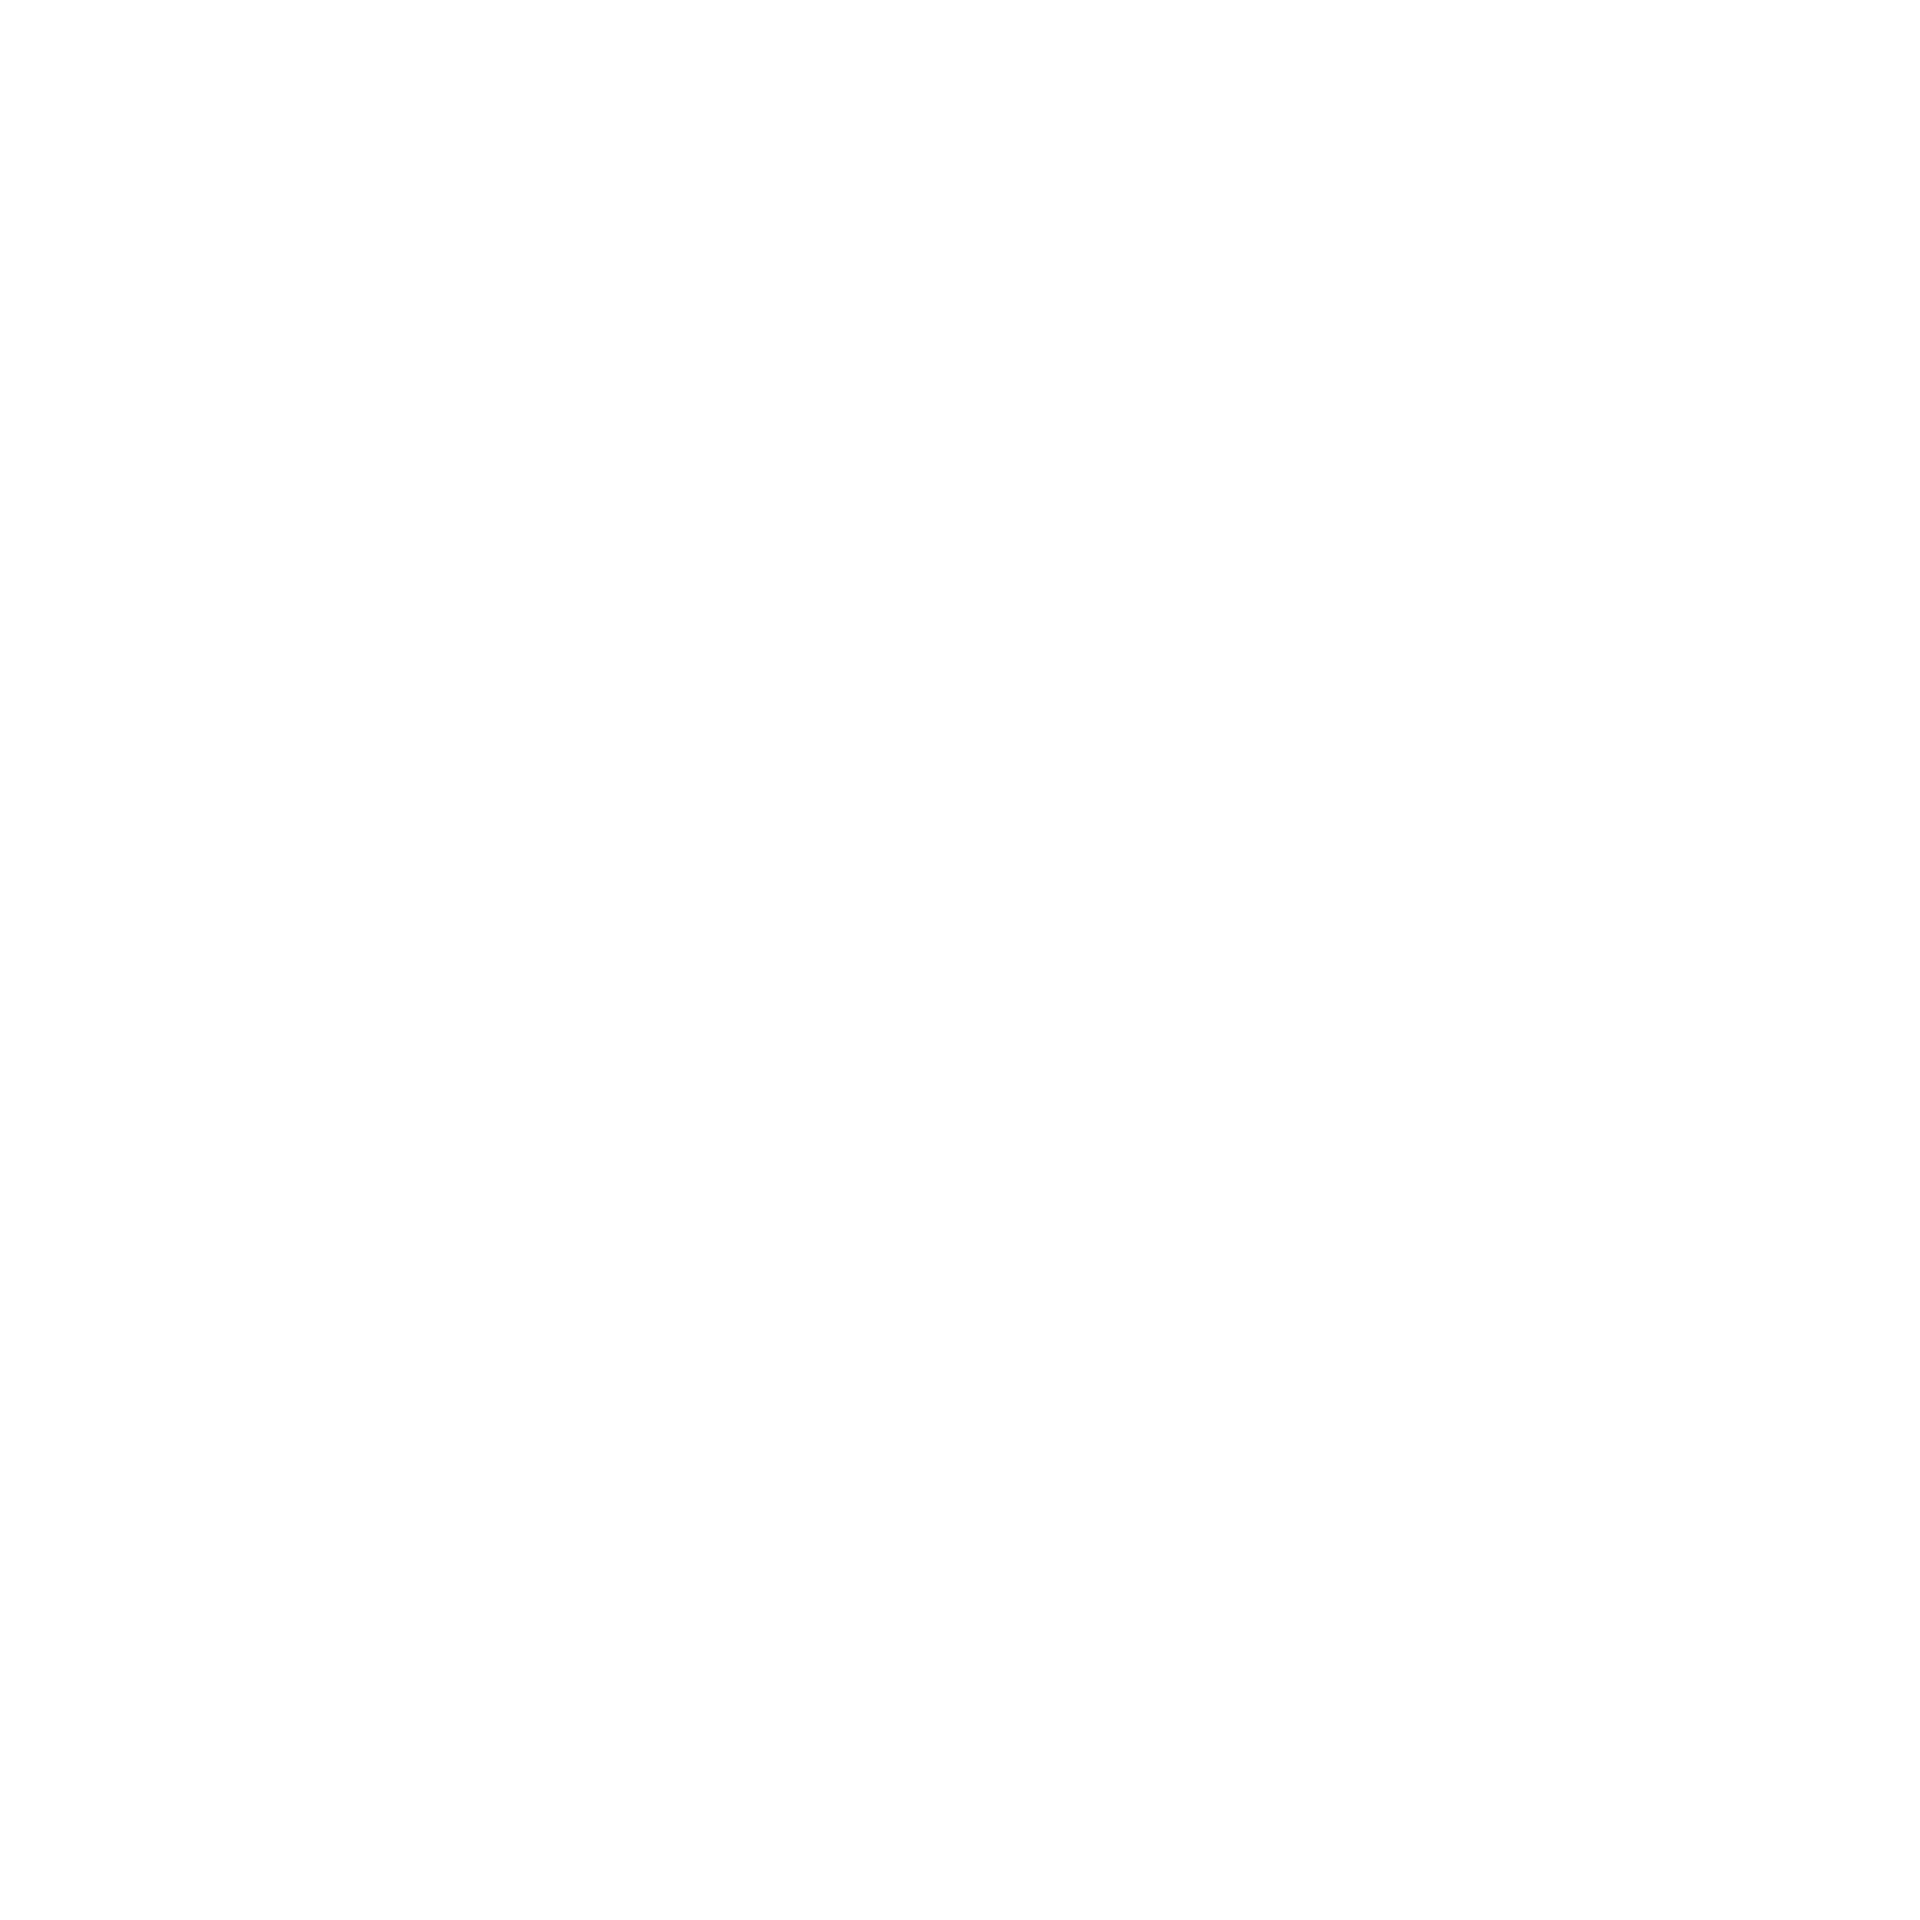 federales chicago logo